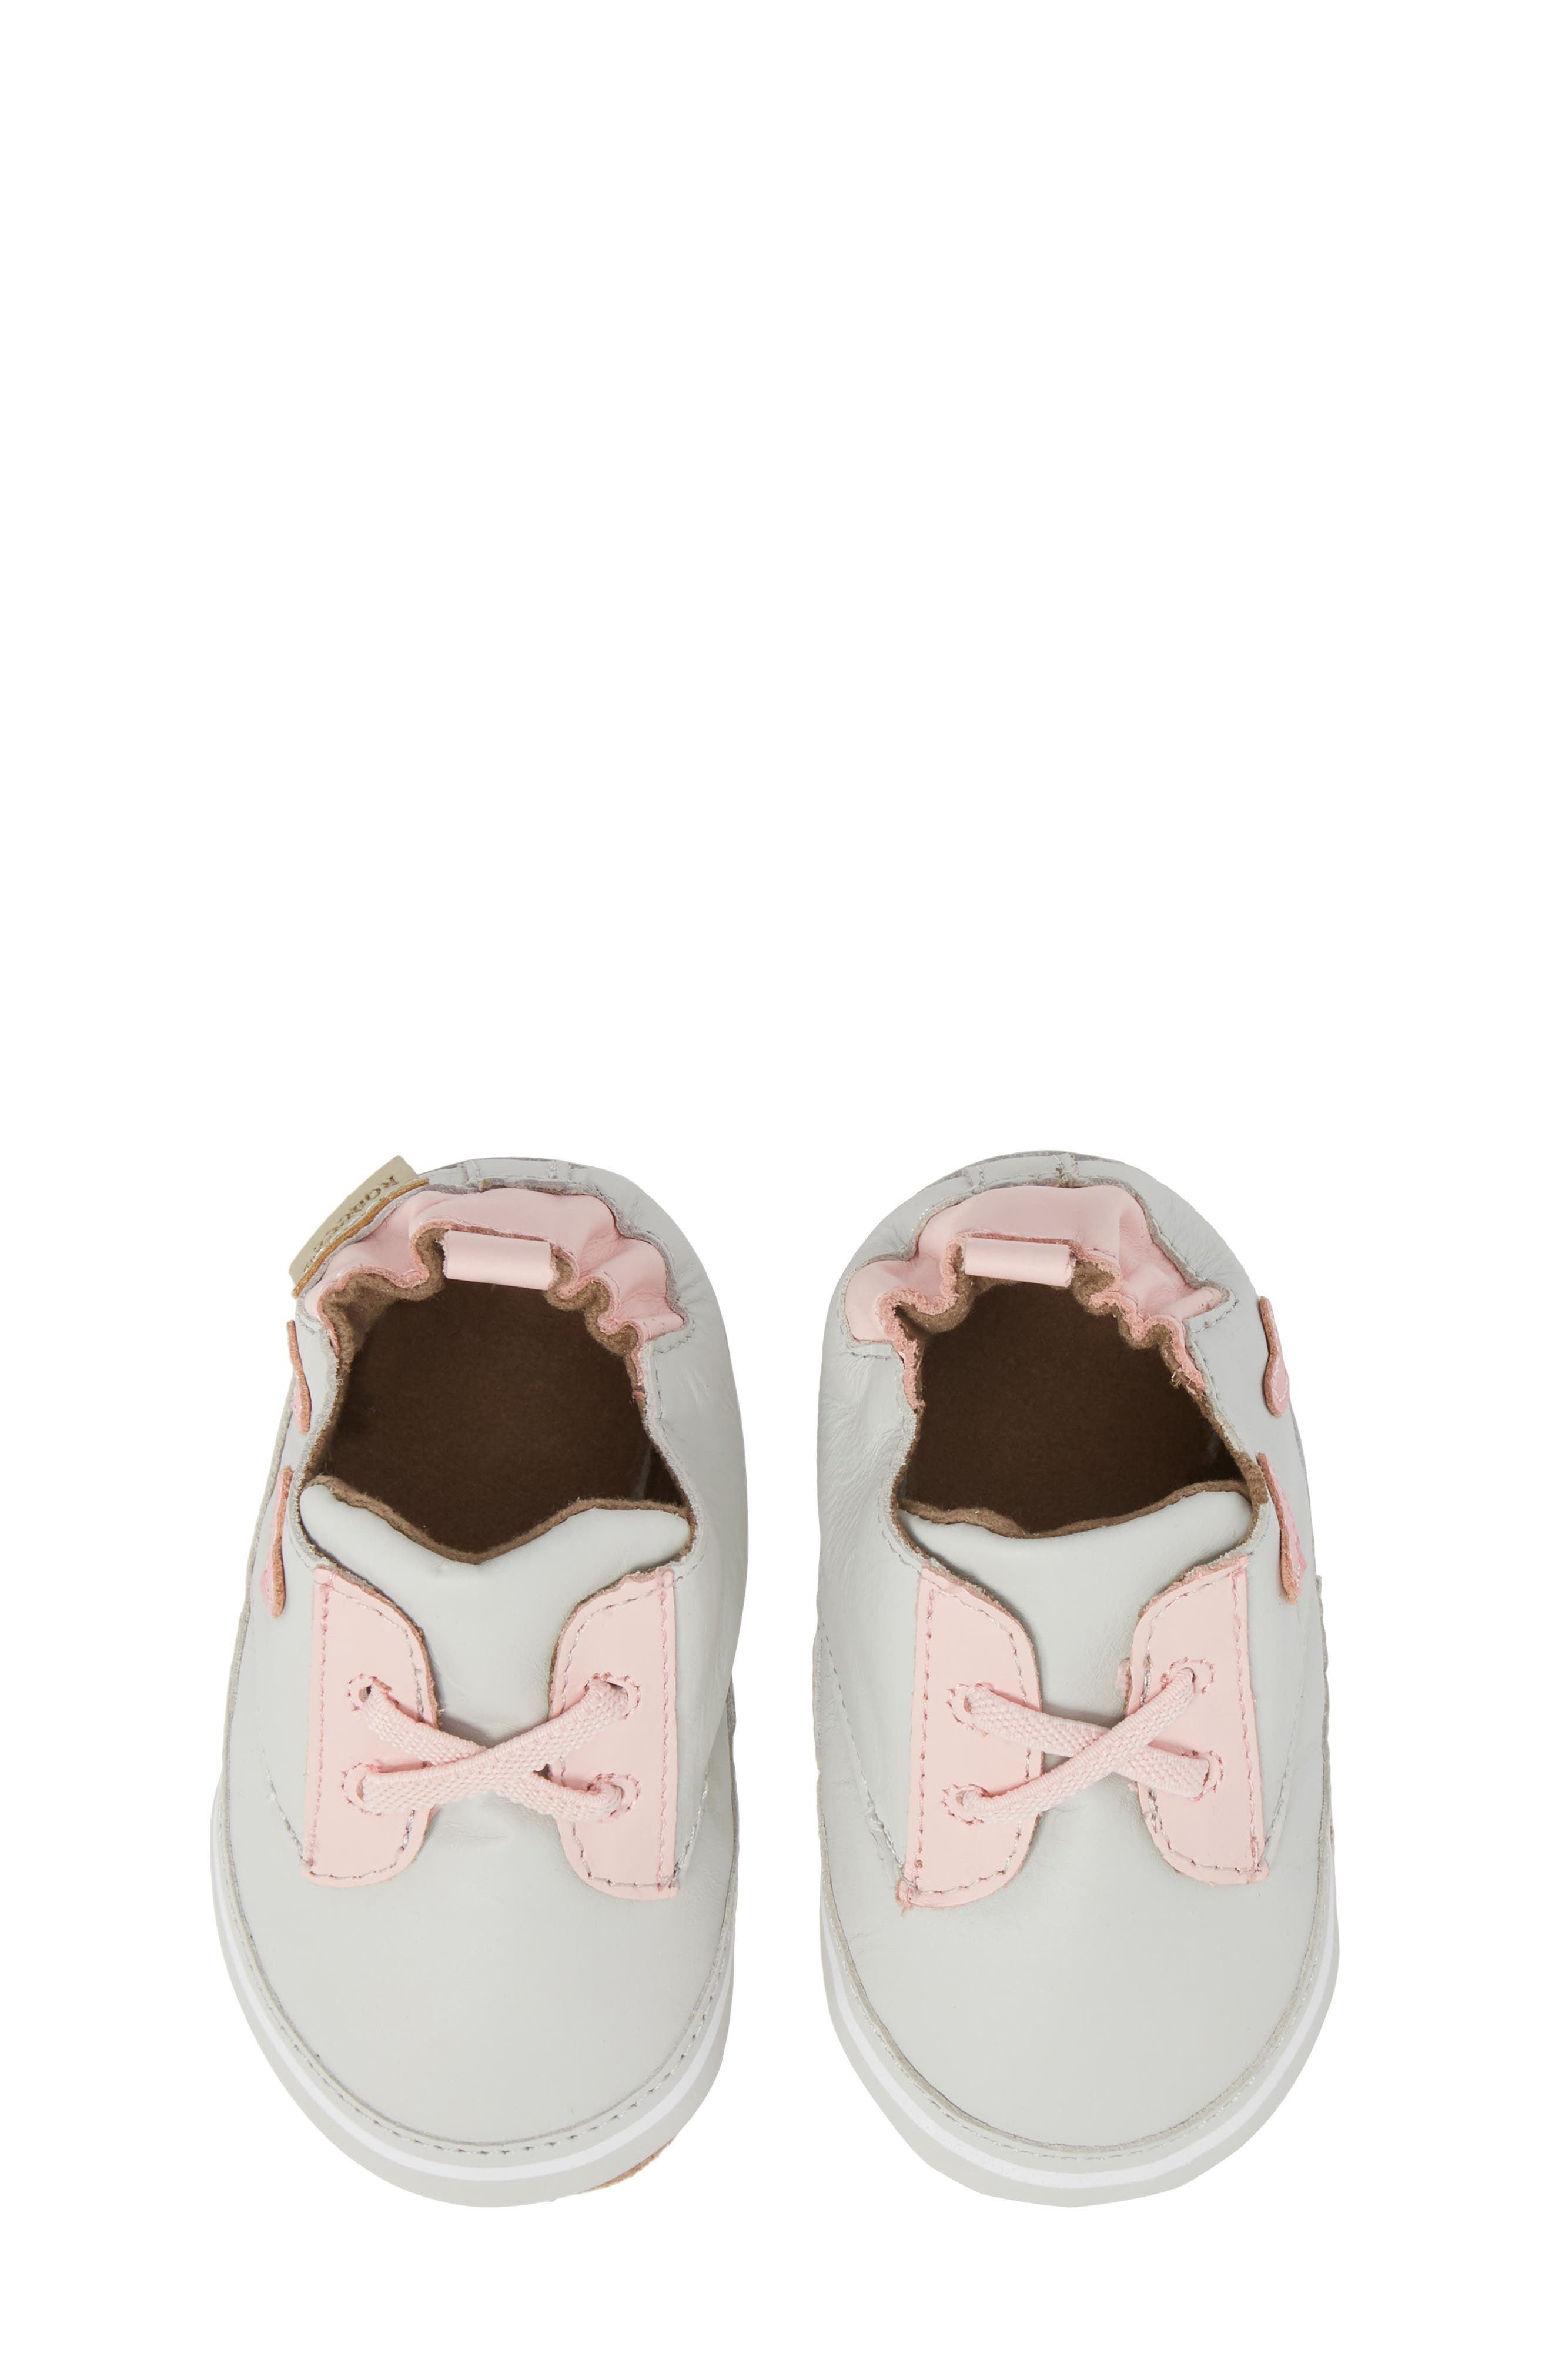 Alternate Image 1 Selected - Robeez® Heartbreaker Slip-On Crib Sneaker (Baby & Walker)